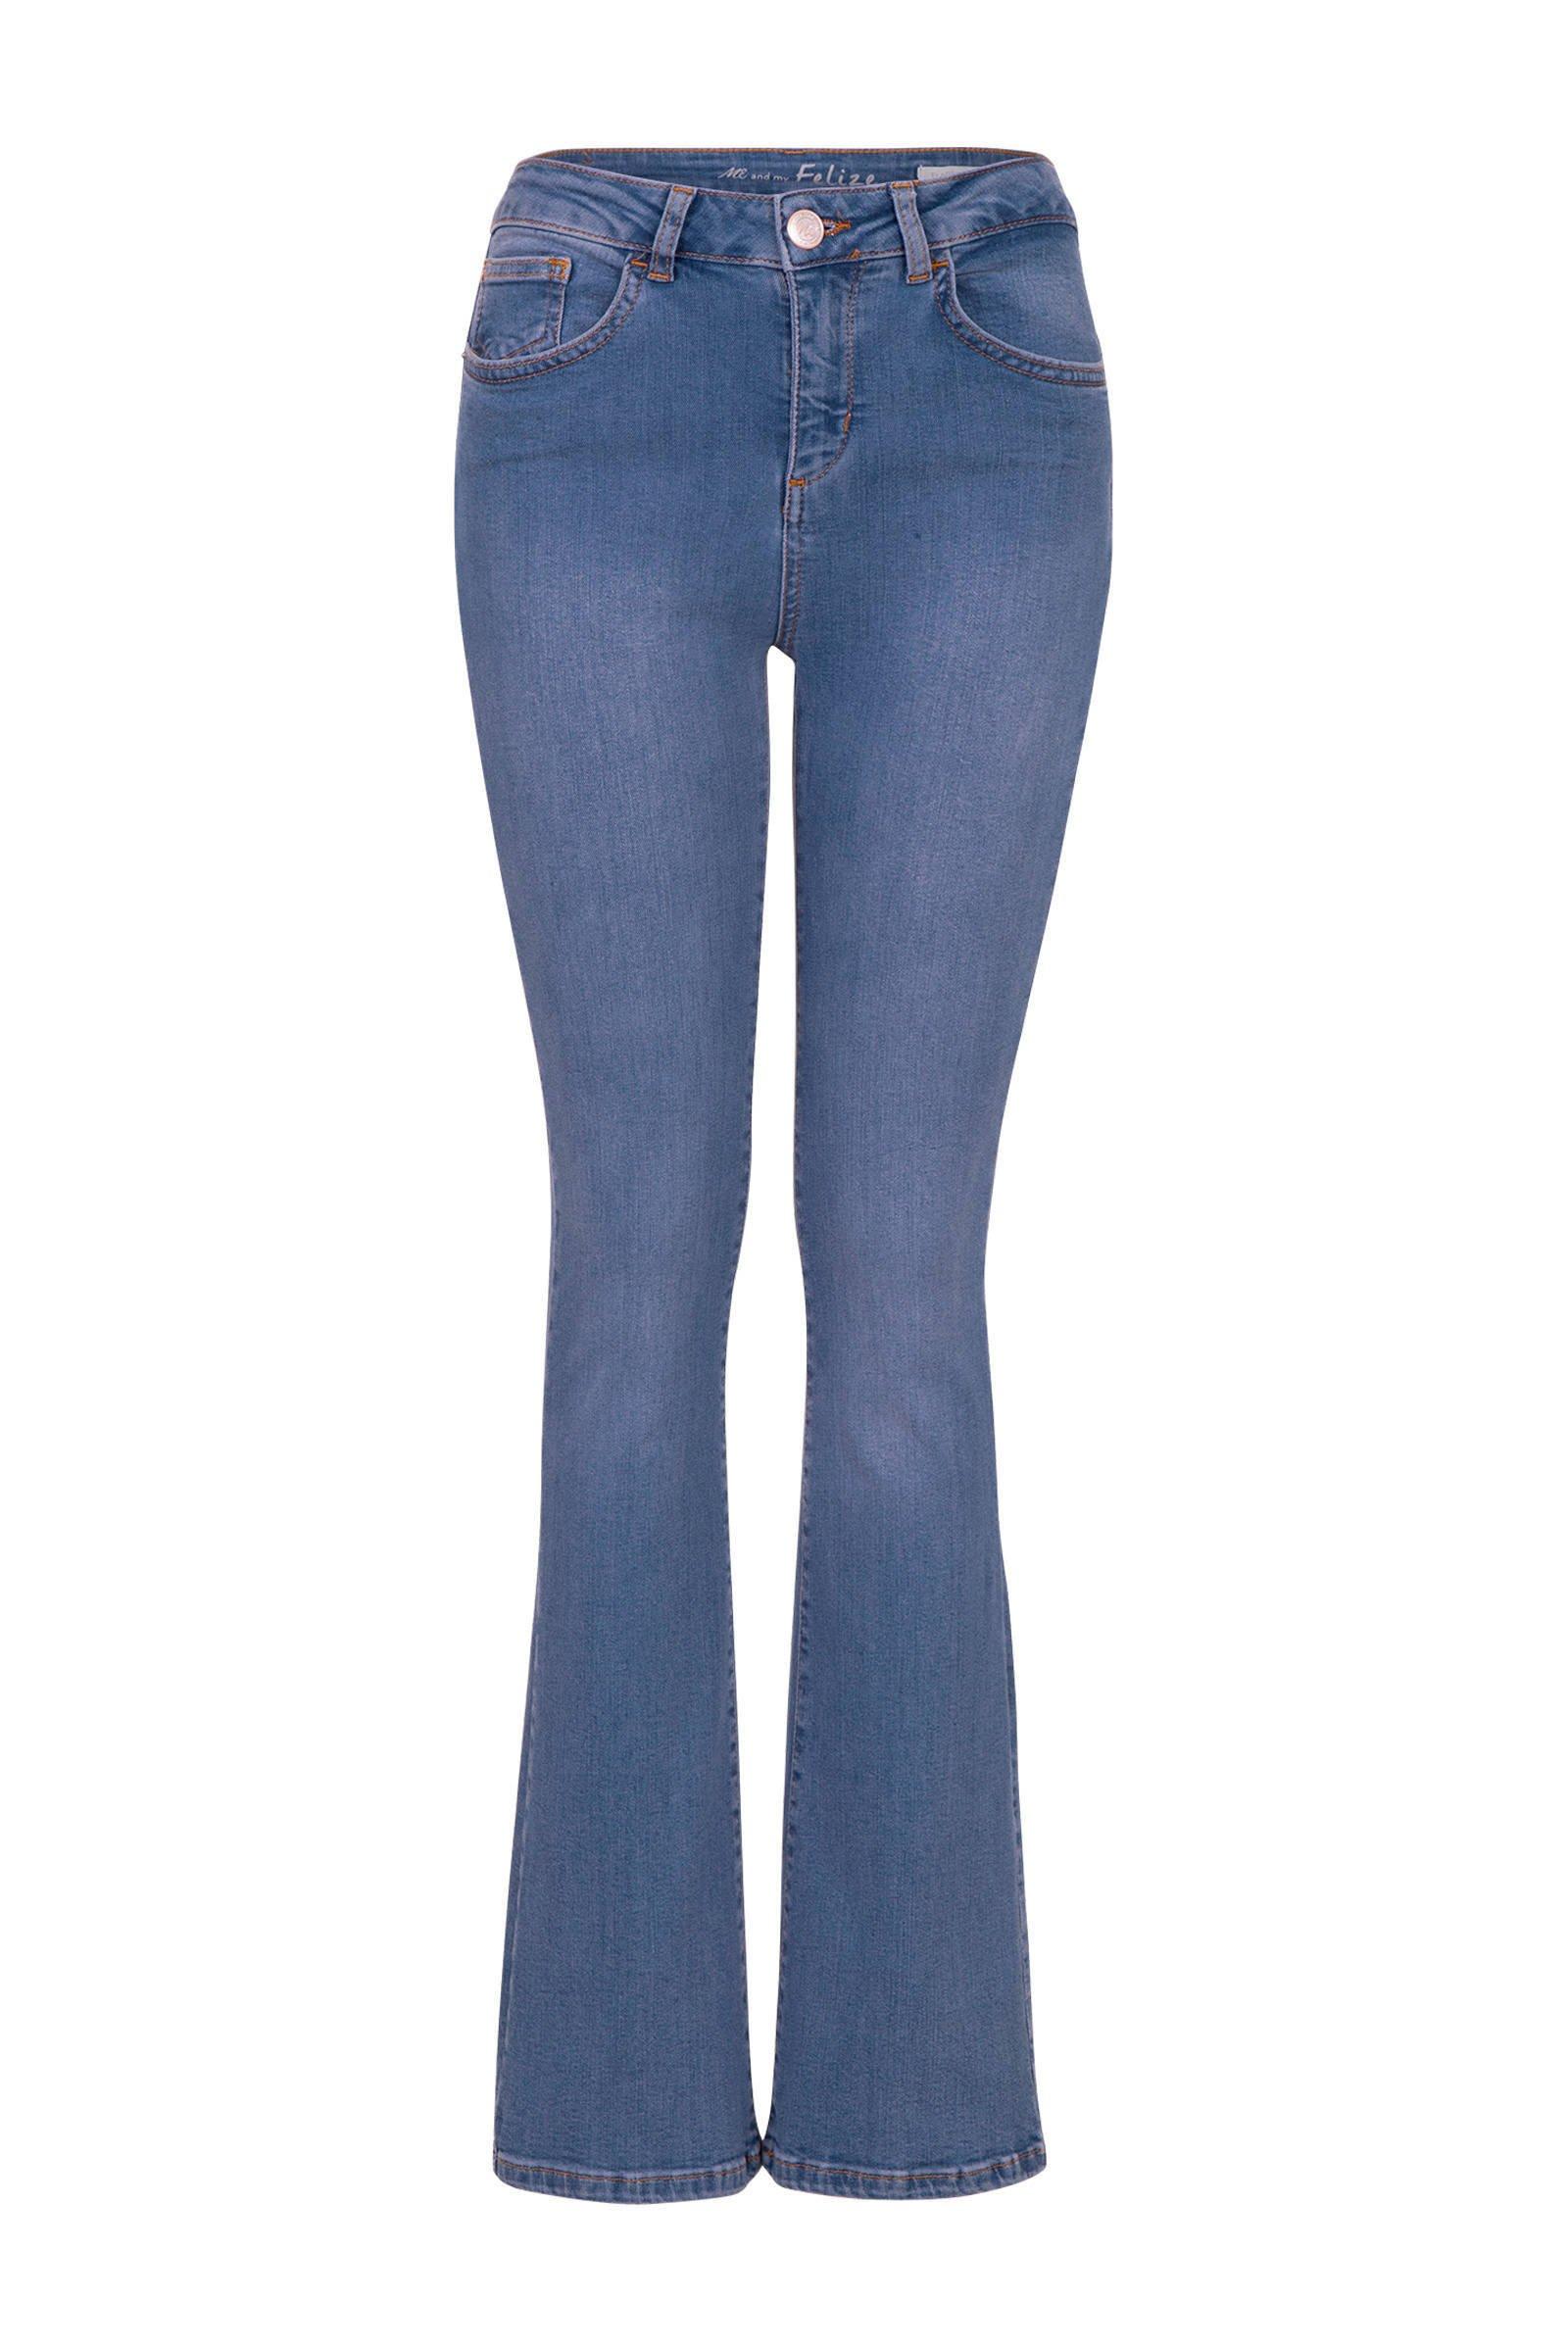 flared jeans Felize 32 inch blauw